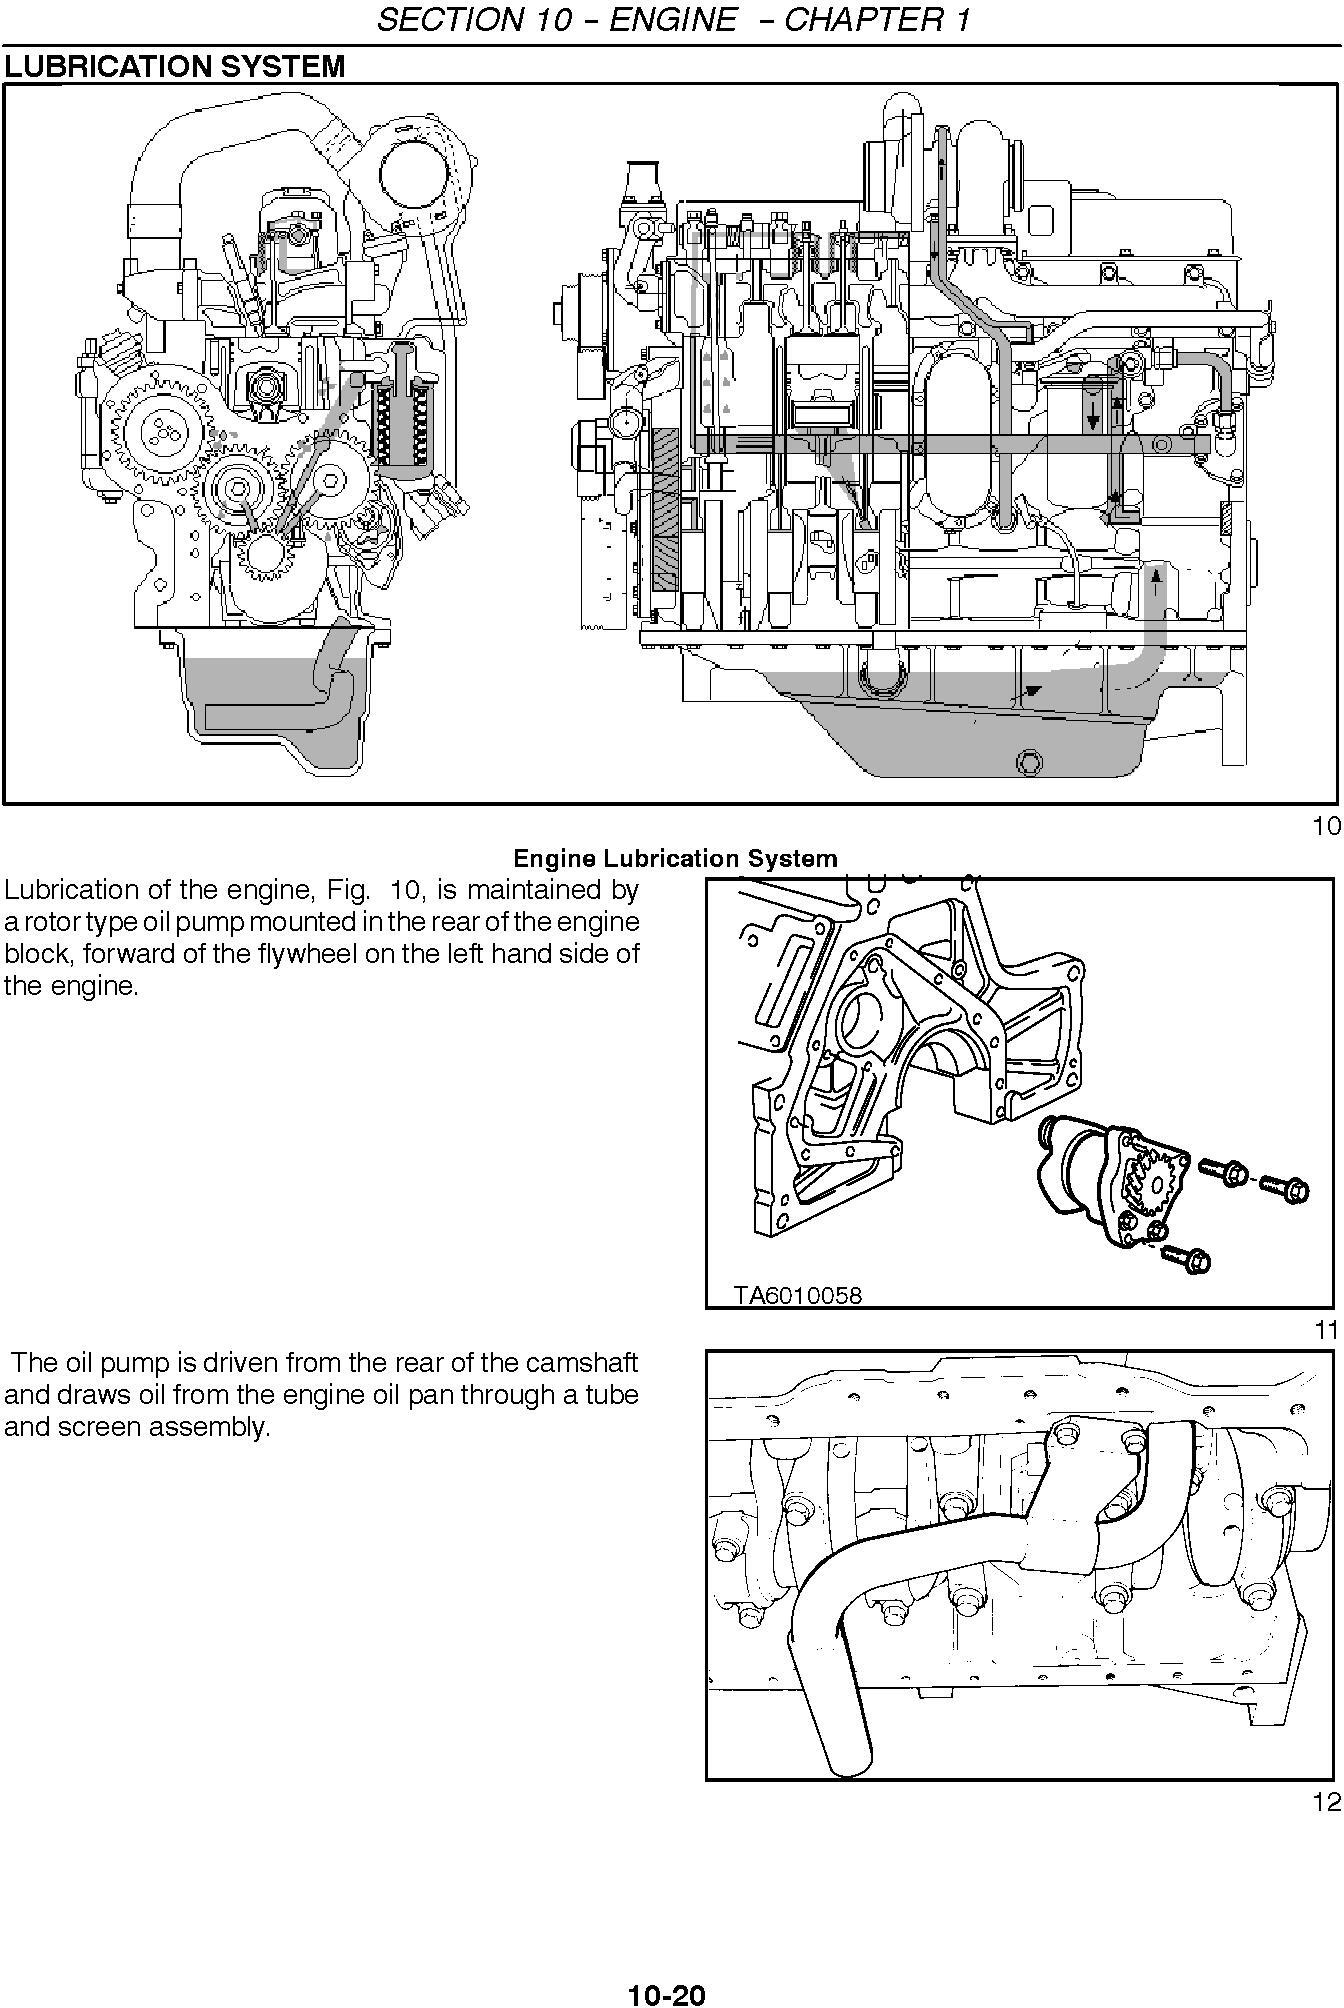 New Holland CX720, CX740, CX760, CX780, CX820, CX840, CX860, CX880 Combine Service Manual - 2